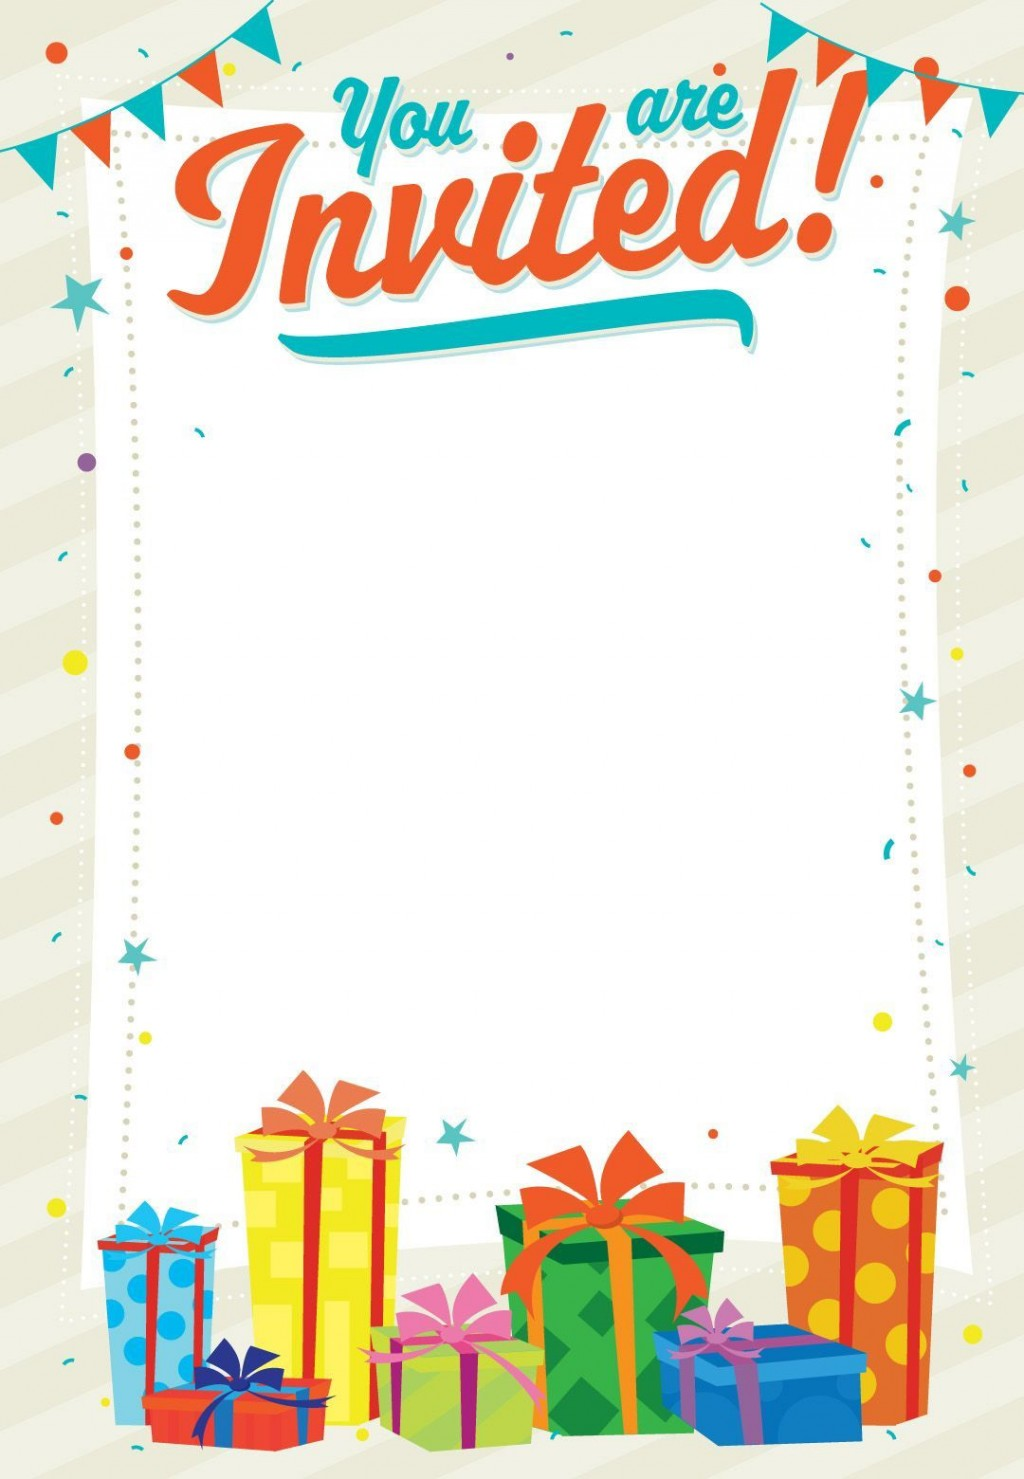 001 Sensational Birthday Card Template Free Concept  Invitation Photoshop Download WordLarge